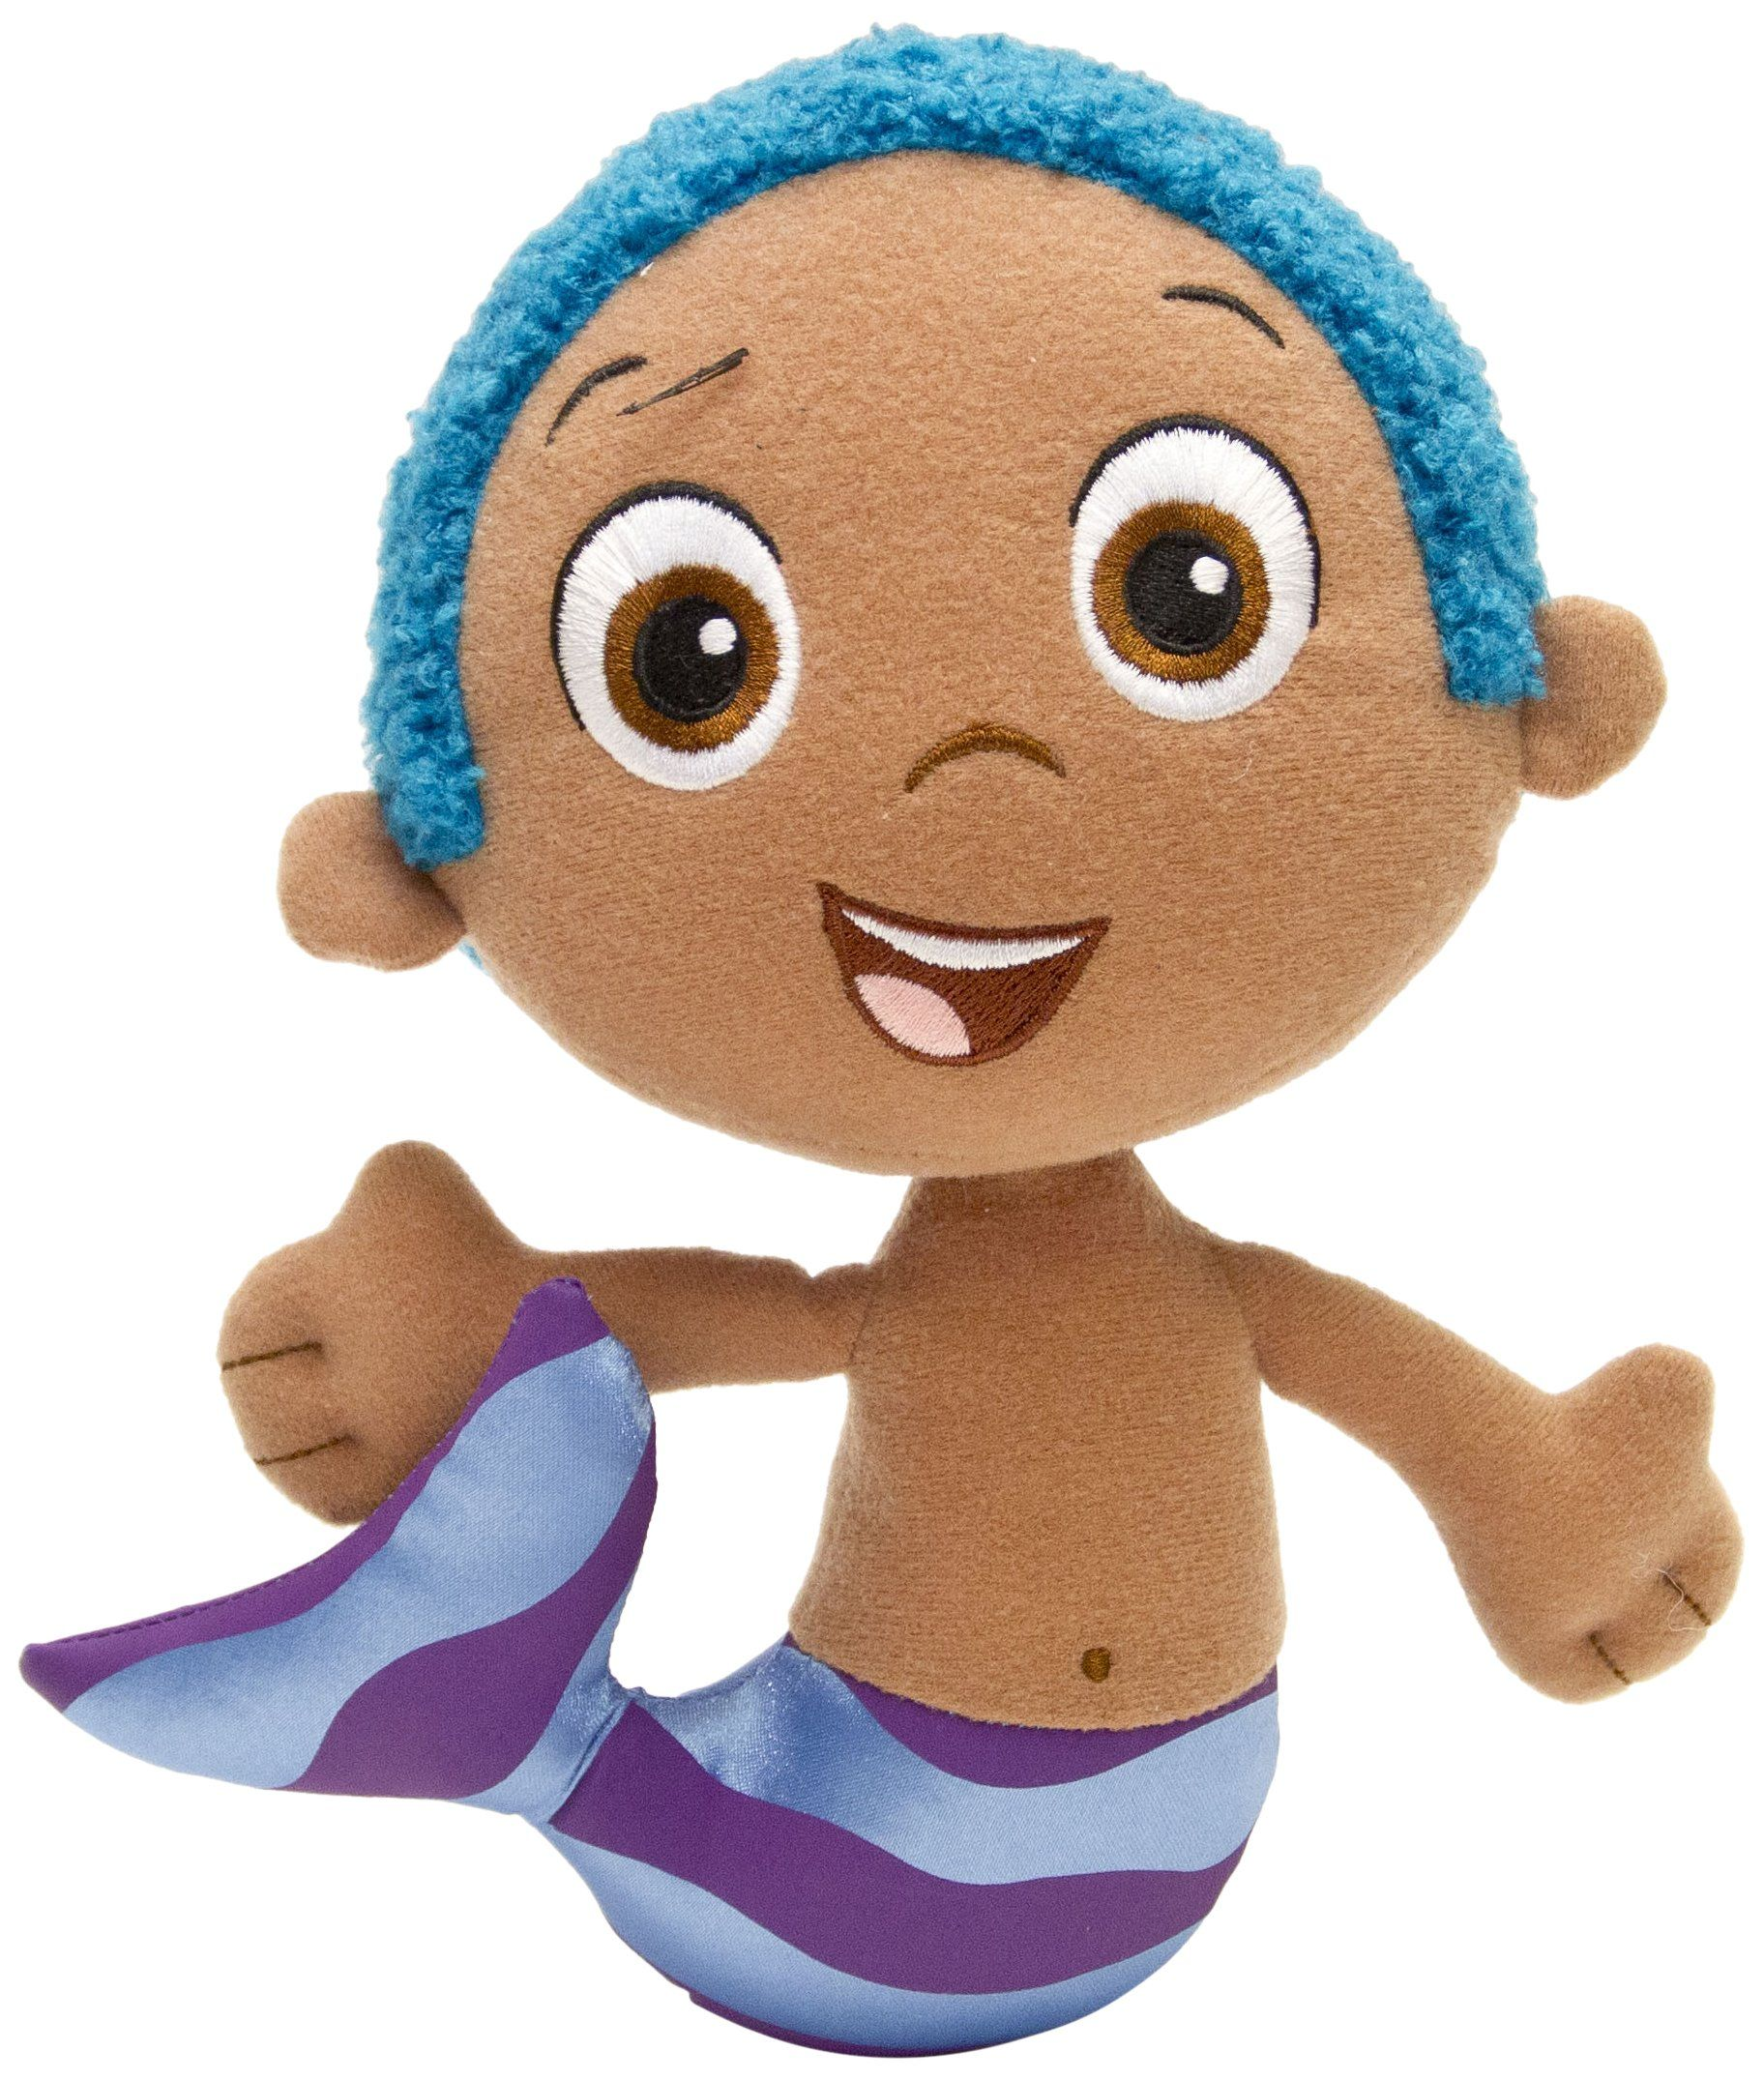 Bubble Guppies Goby Plush Doll | Plush Dolls | Pinterest